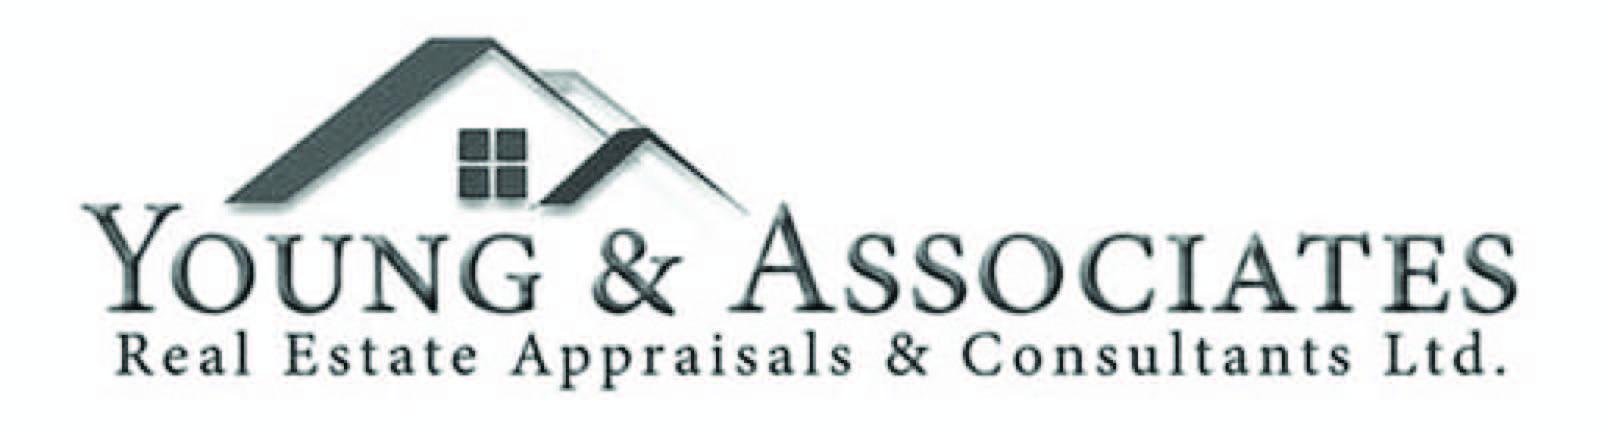 Young & Associates's logo width=